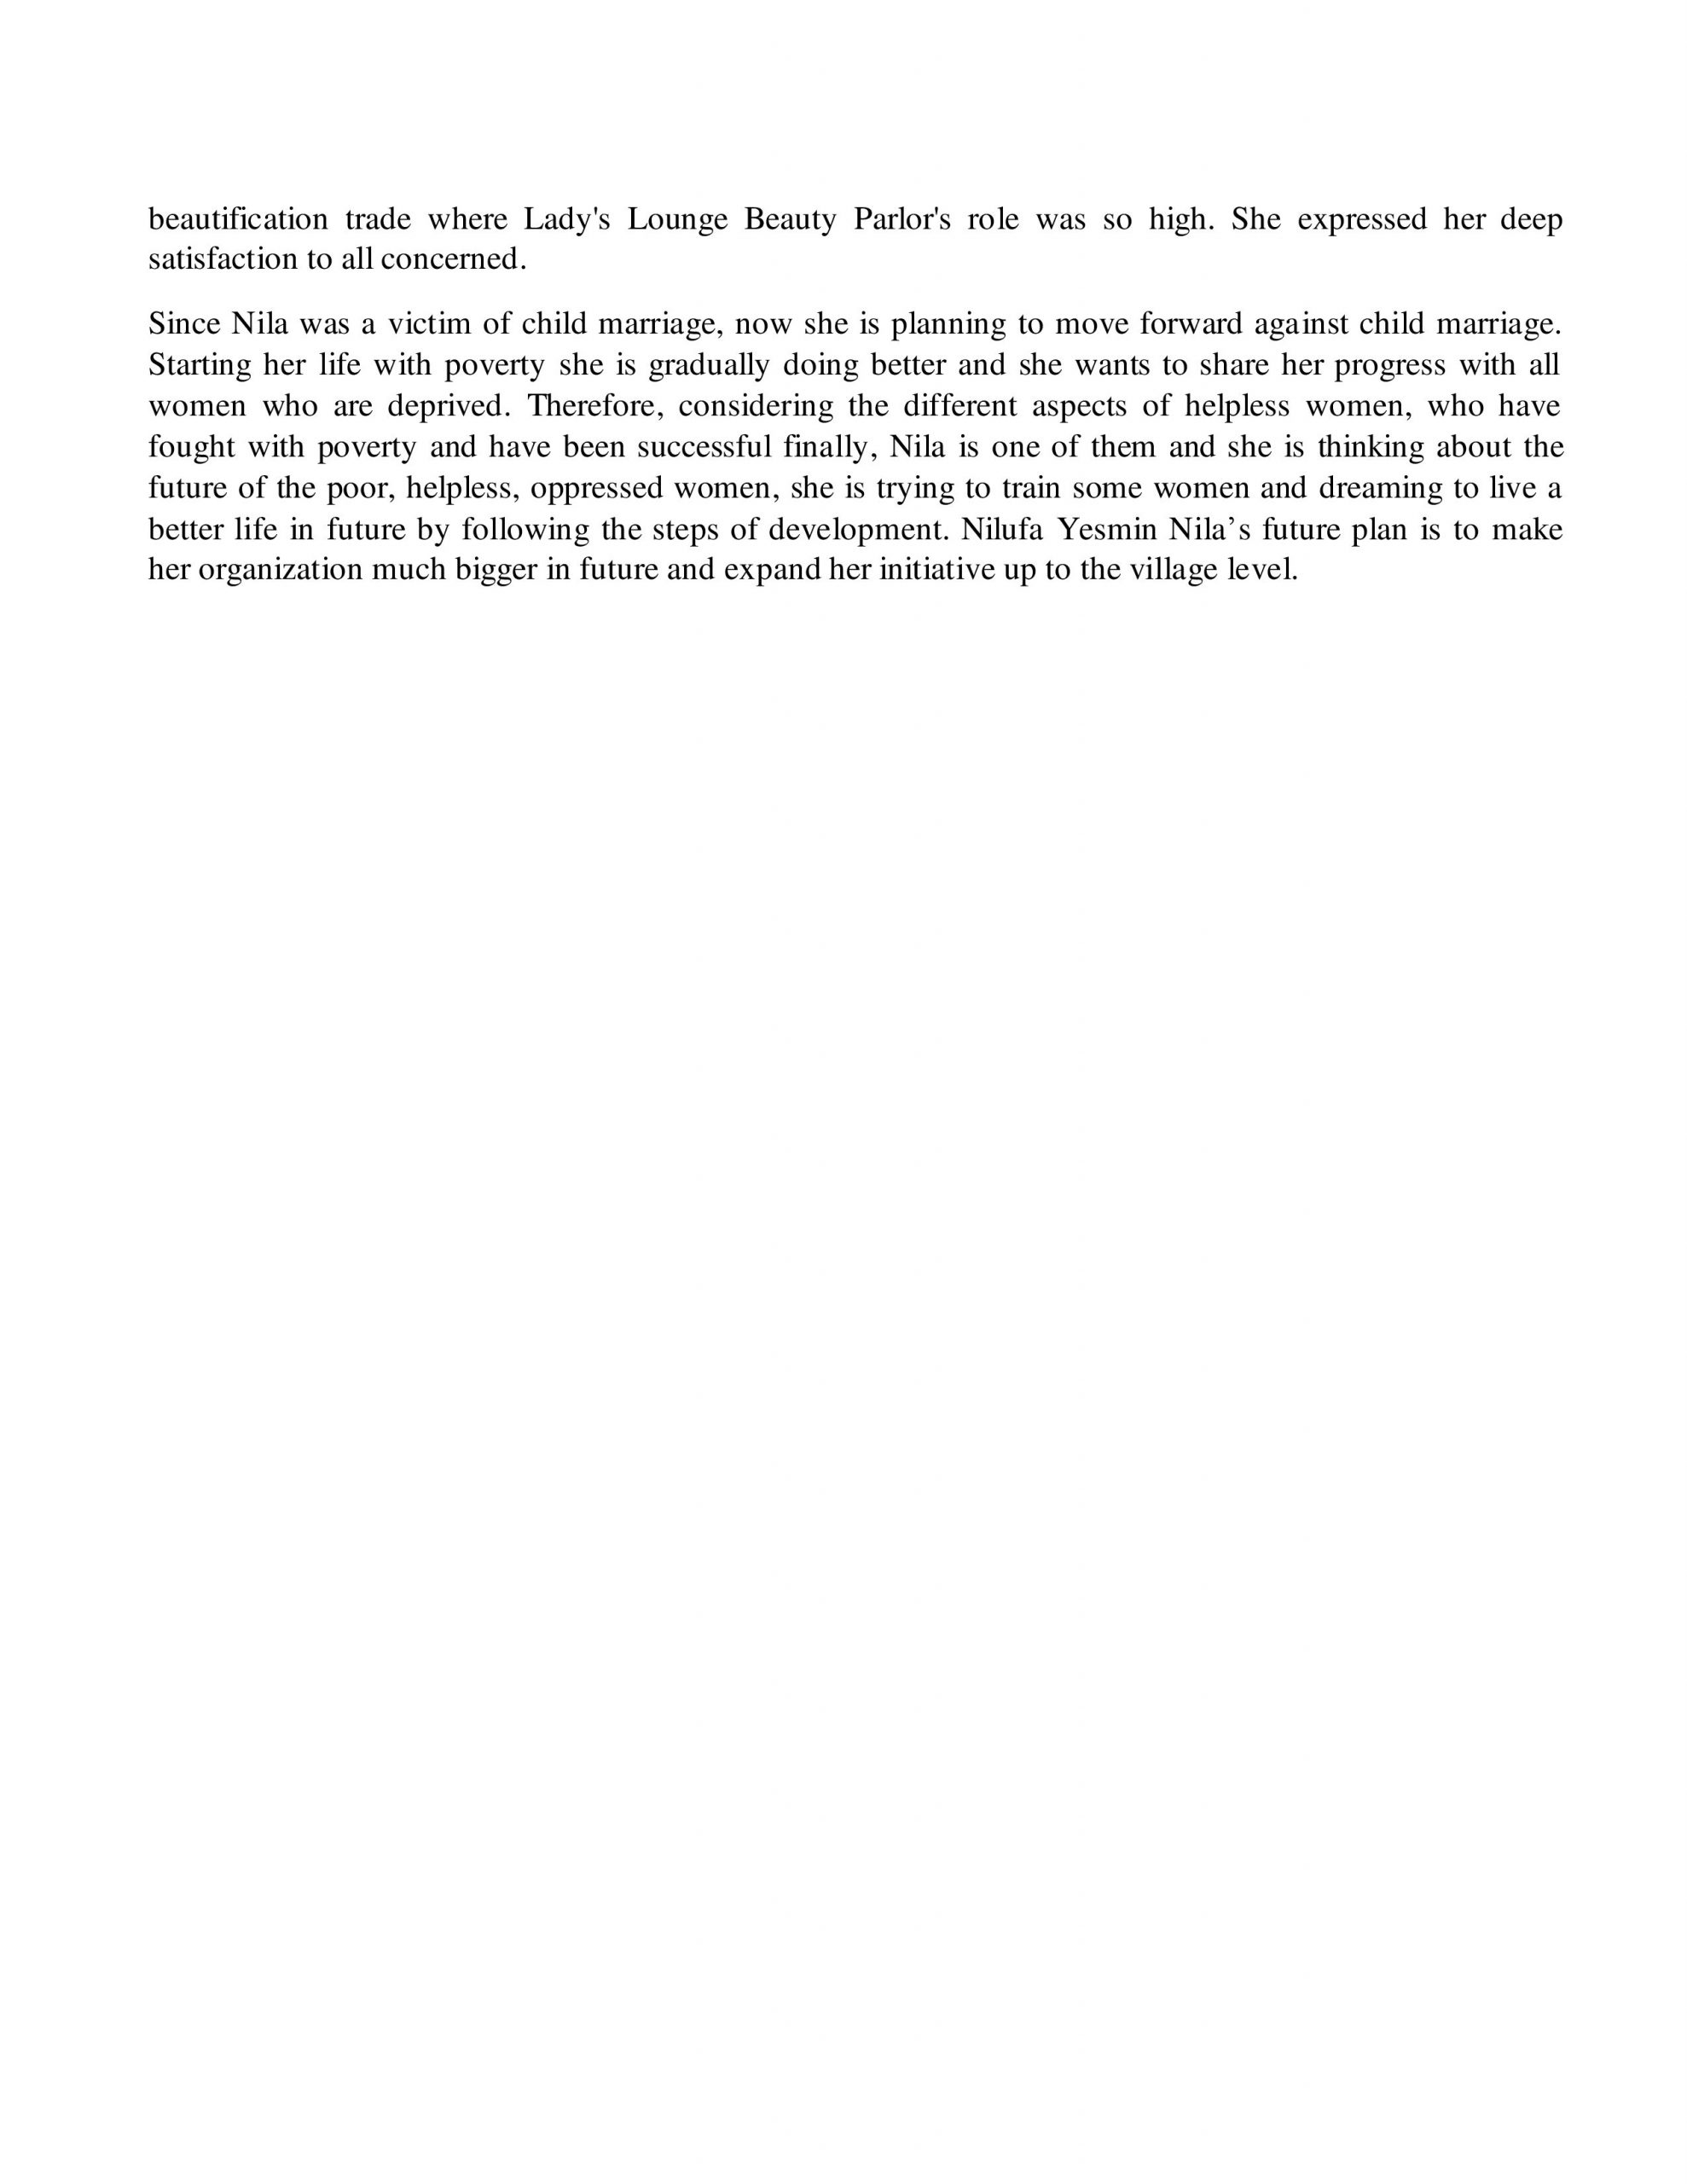 Success story of Nilufar Yesmin- BP- Sylhet_3